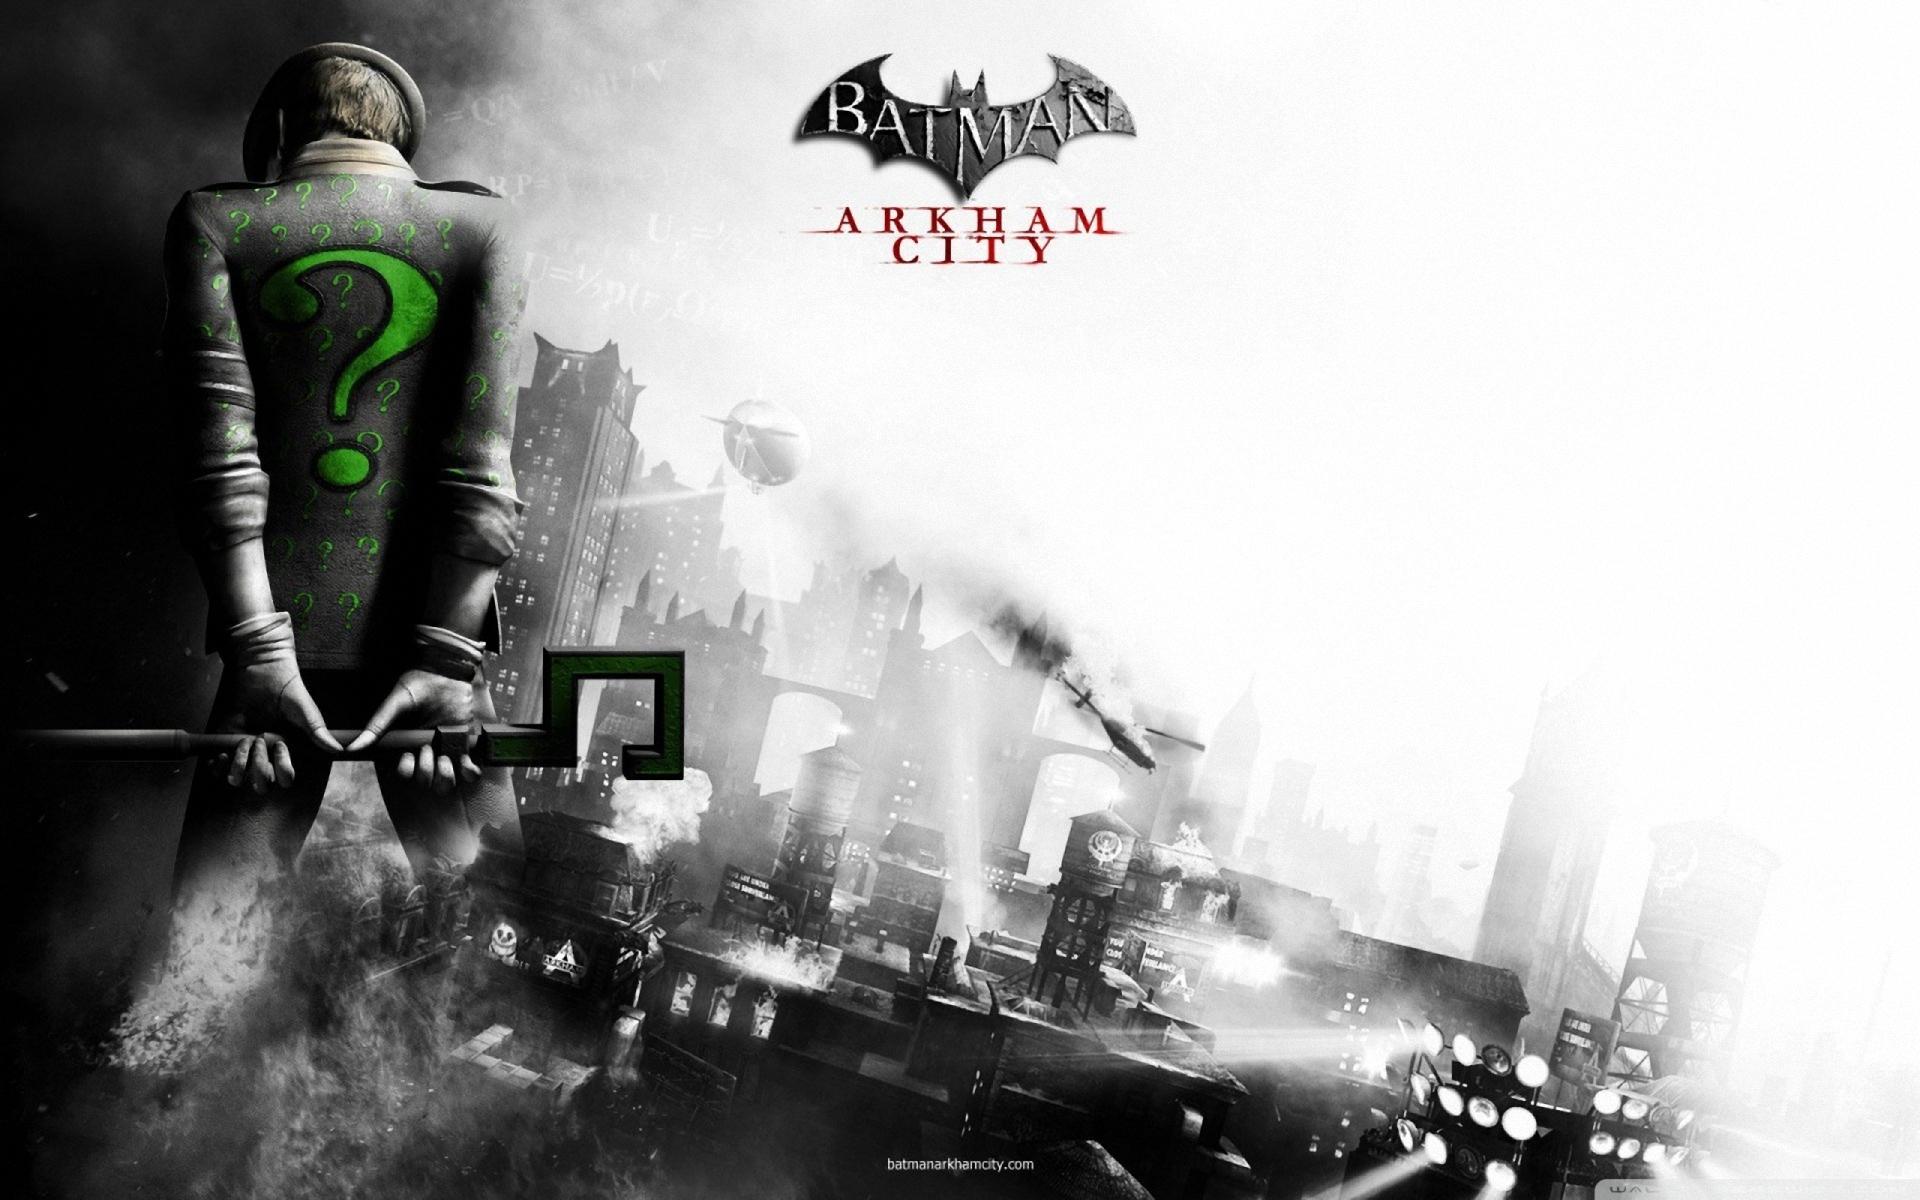 wallpaper : illustration, city, batman arkham city, back, screenshot